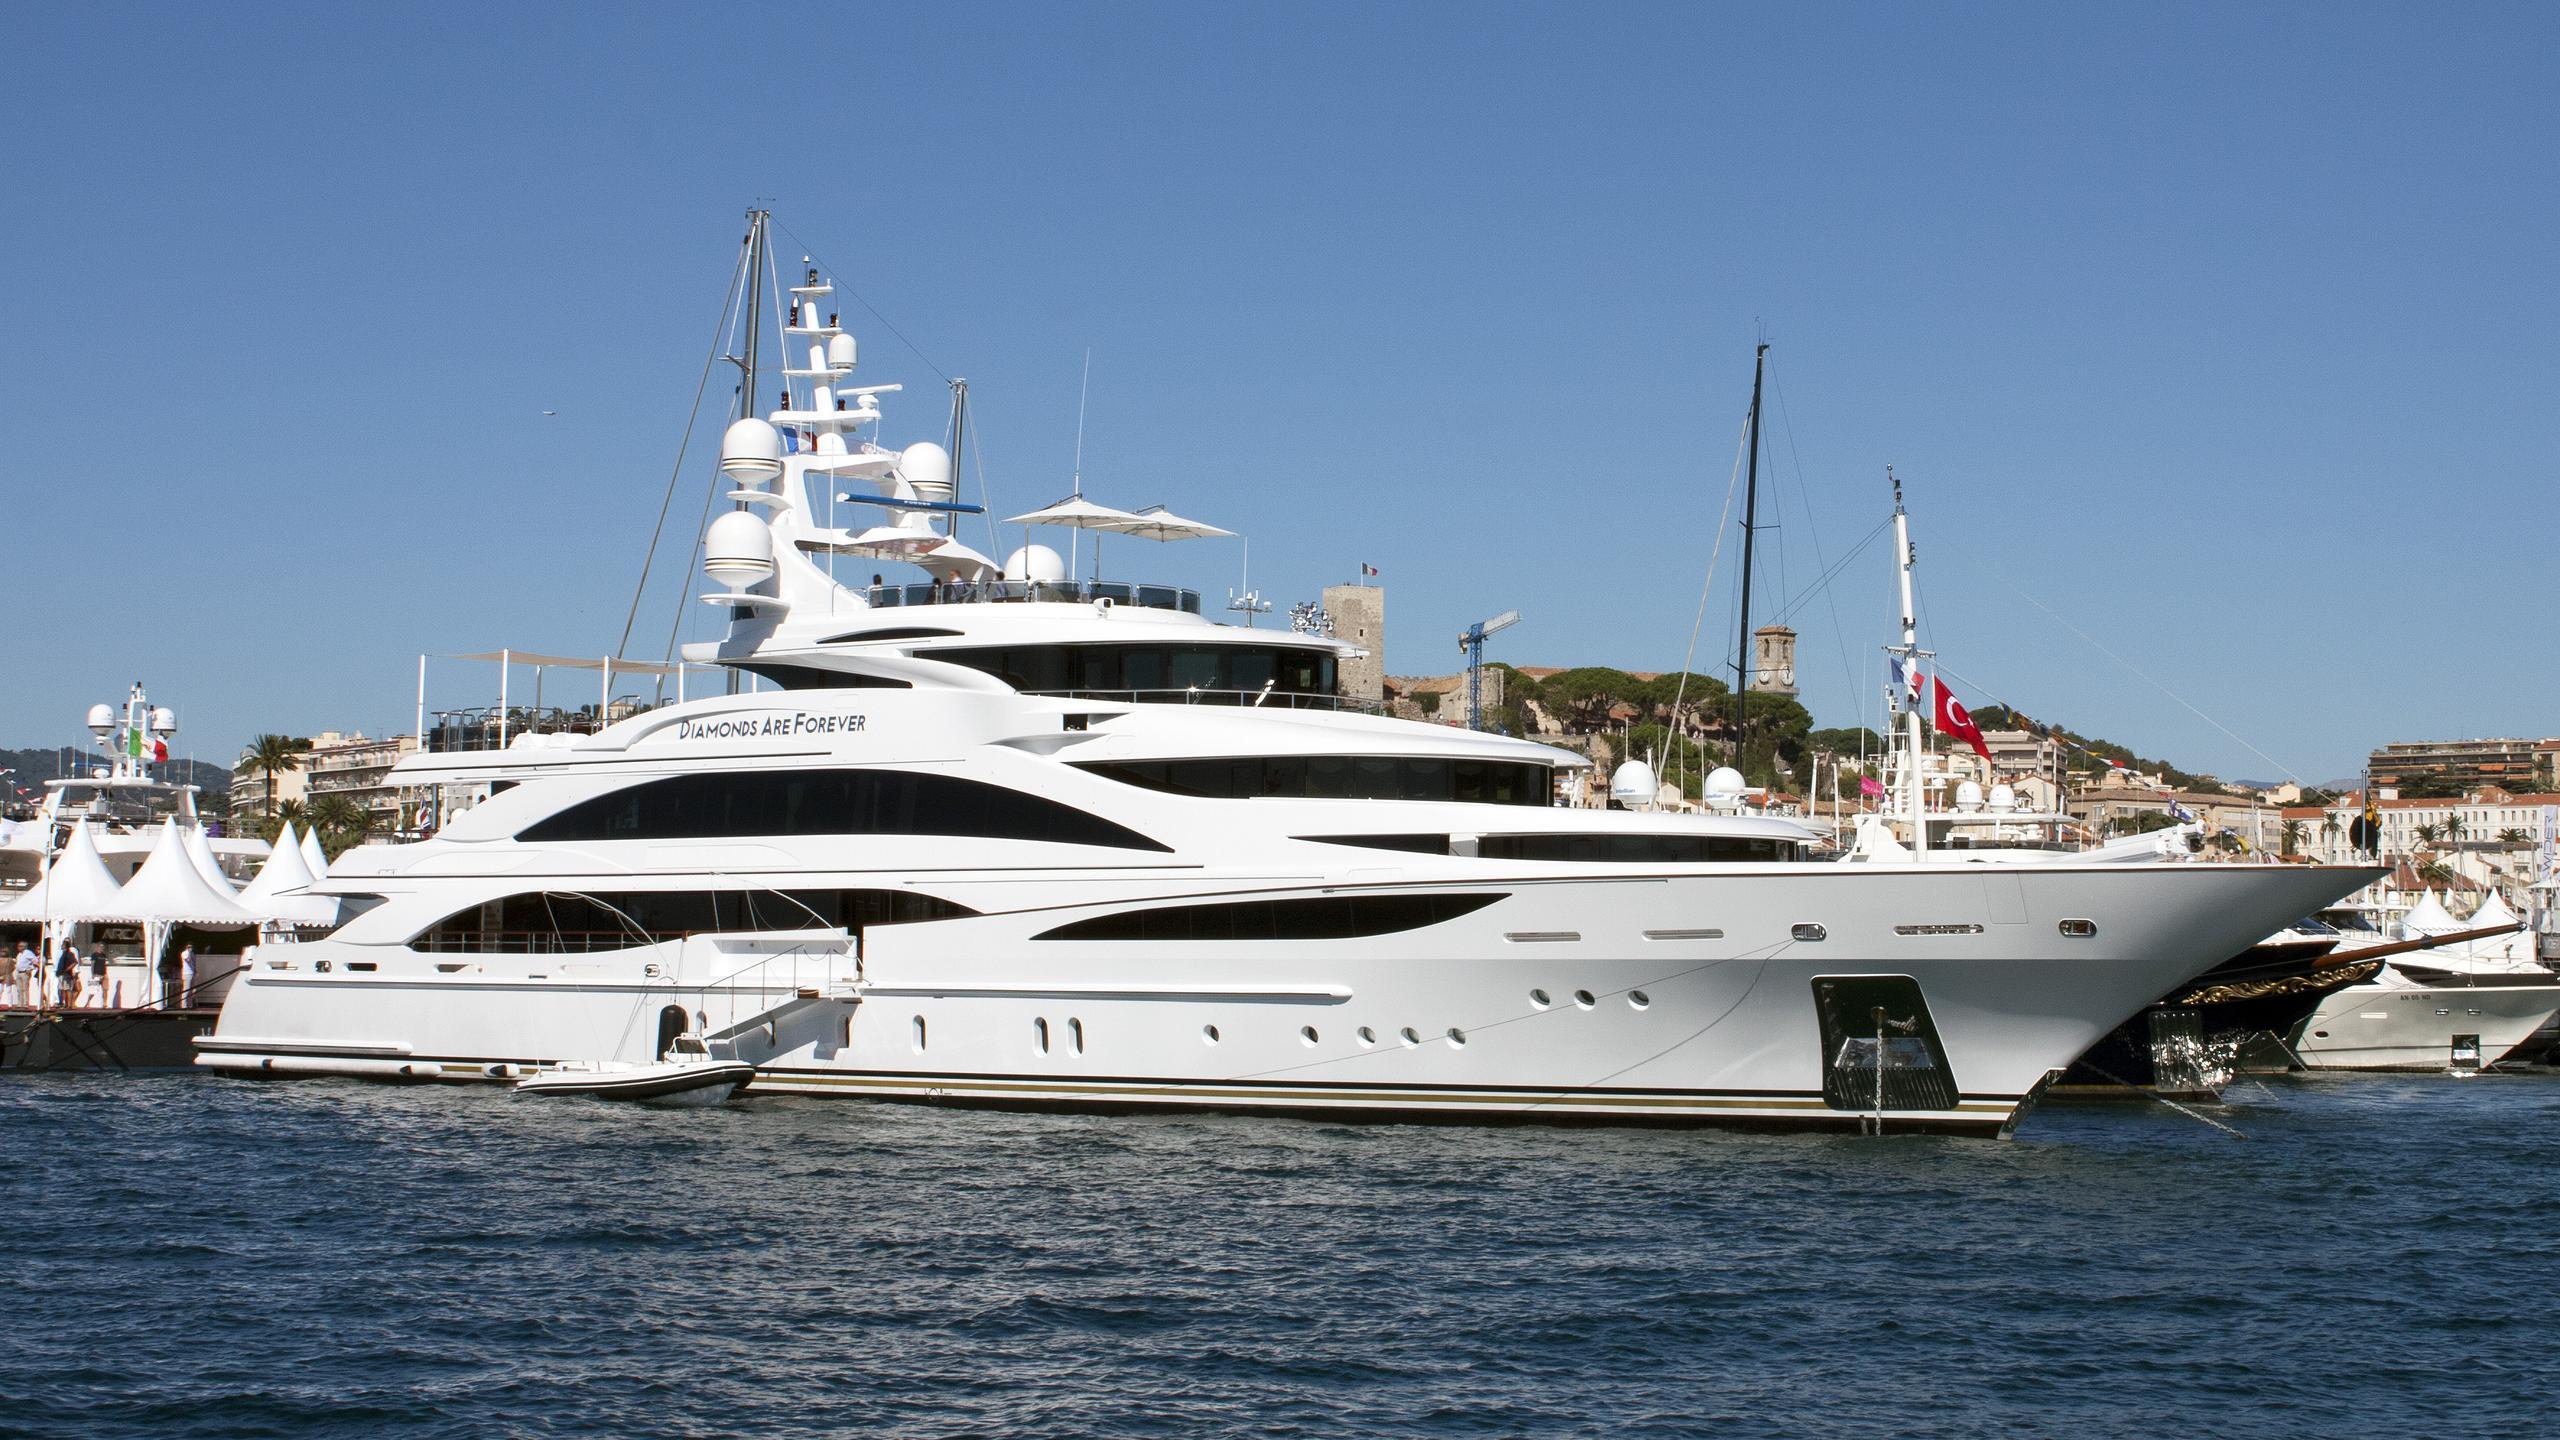 diamonds-are-forever-motor-yacht-benetti-2011-61m-half-profile